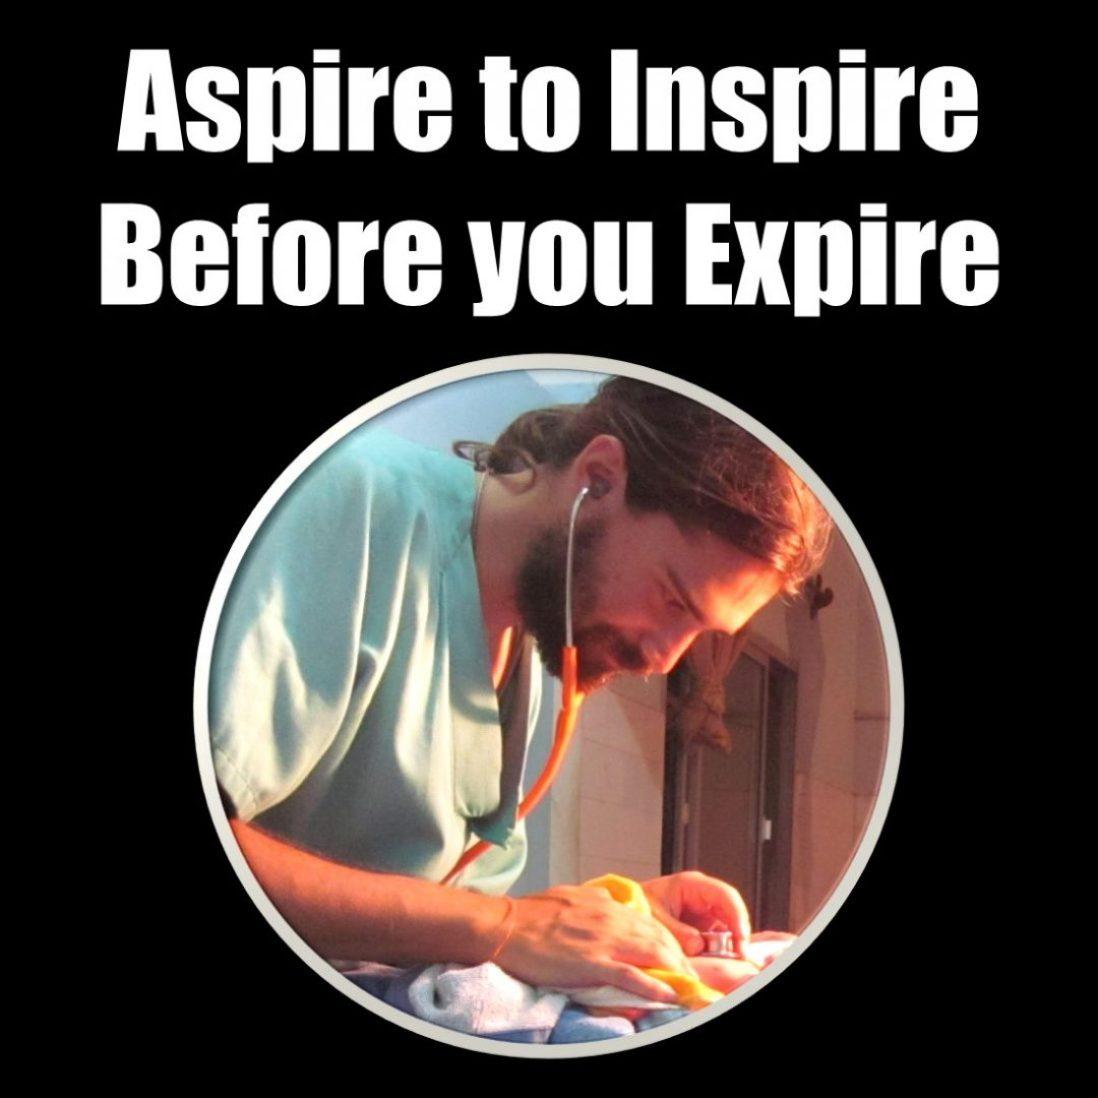 Aspire to Inspire before you Expire alegria gambo alegria sin fronteras dr alegria etiopia